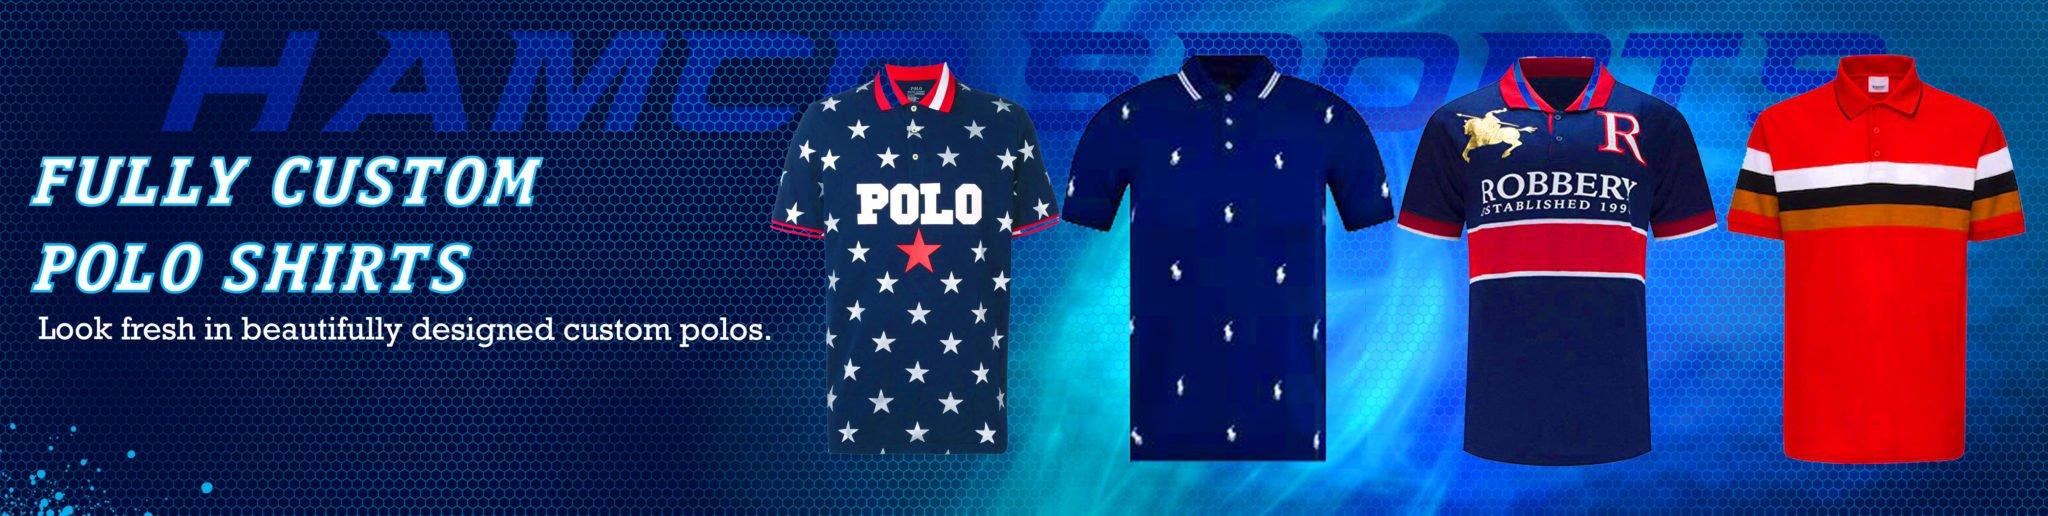 Custom Polo Shirts